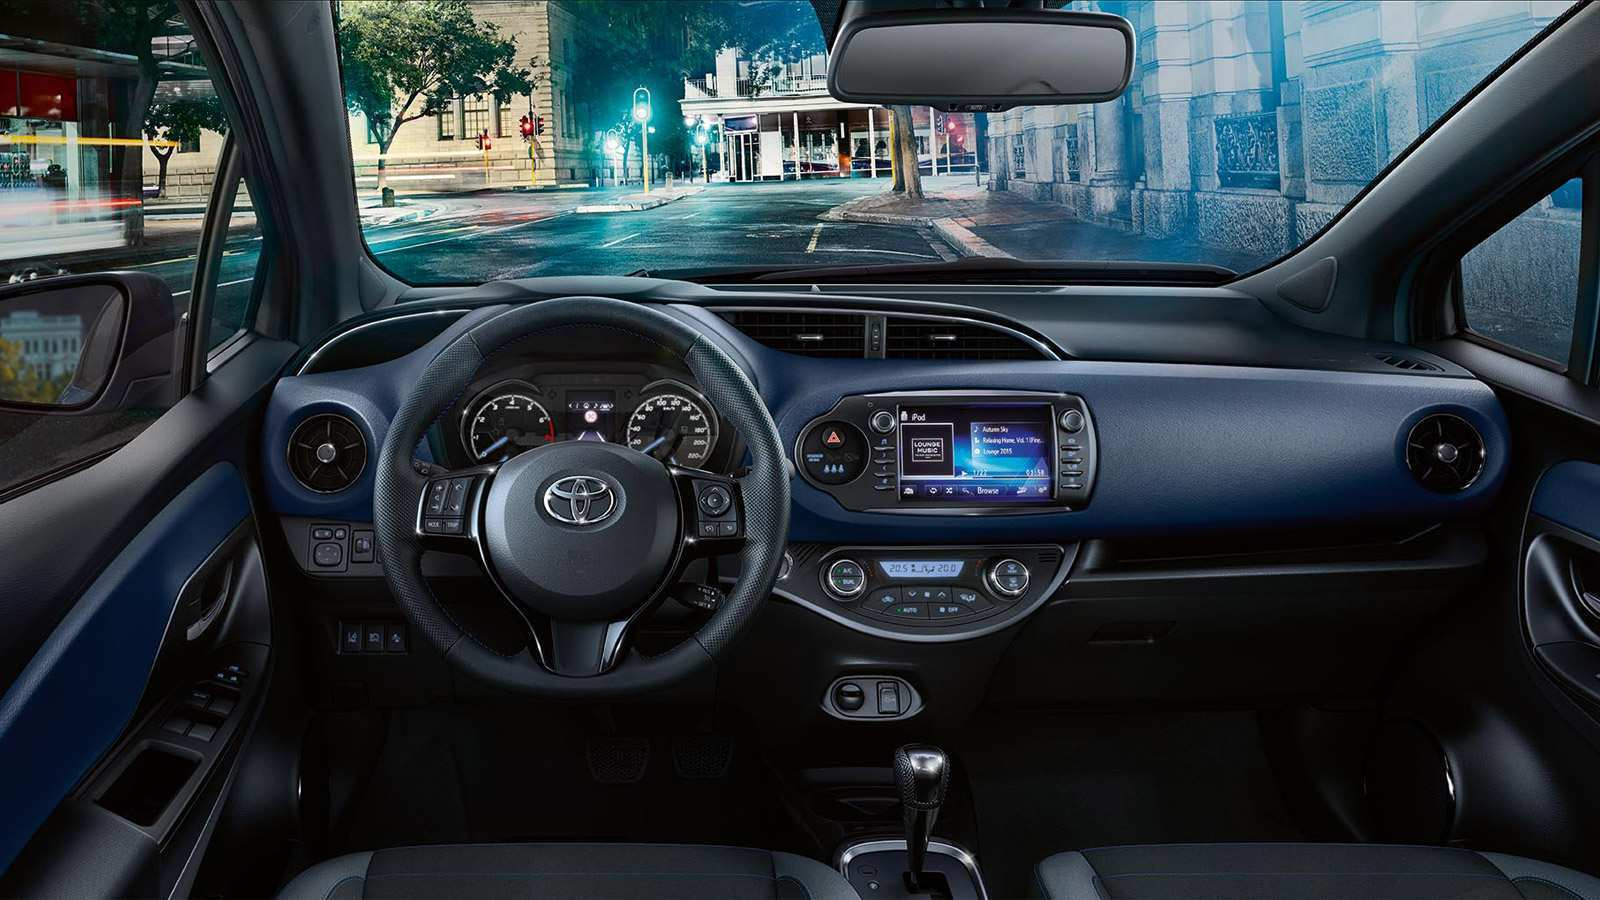 73 New Toyota Yaris 2019 Europe Ratings for Toyota Yaris 2019 Europe